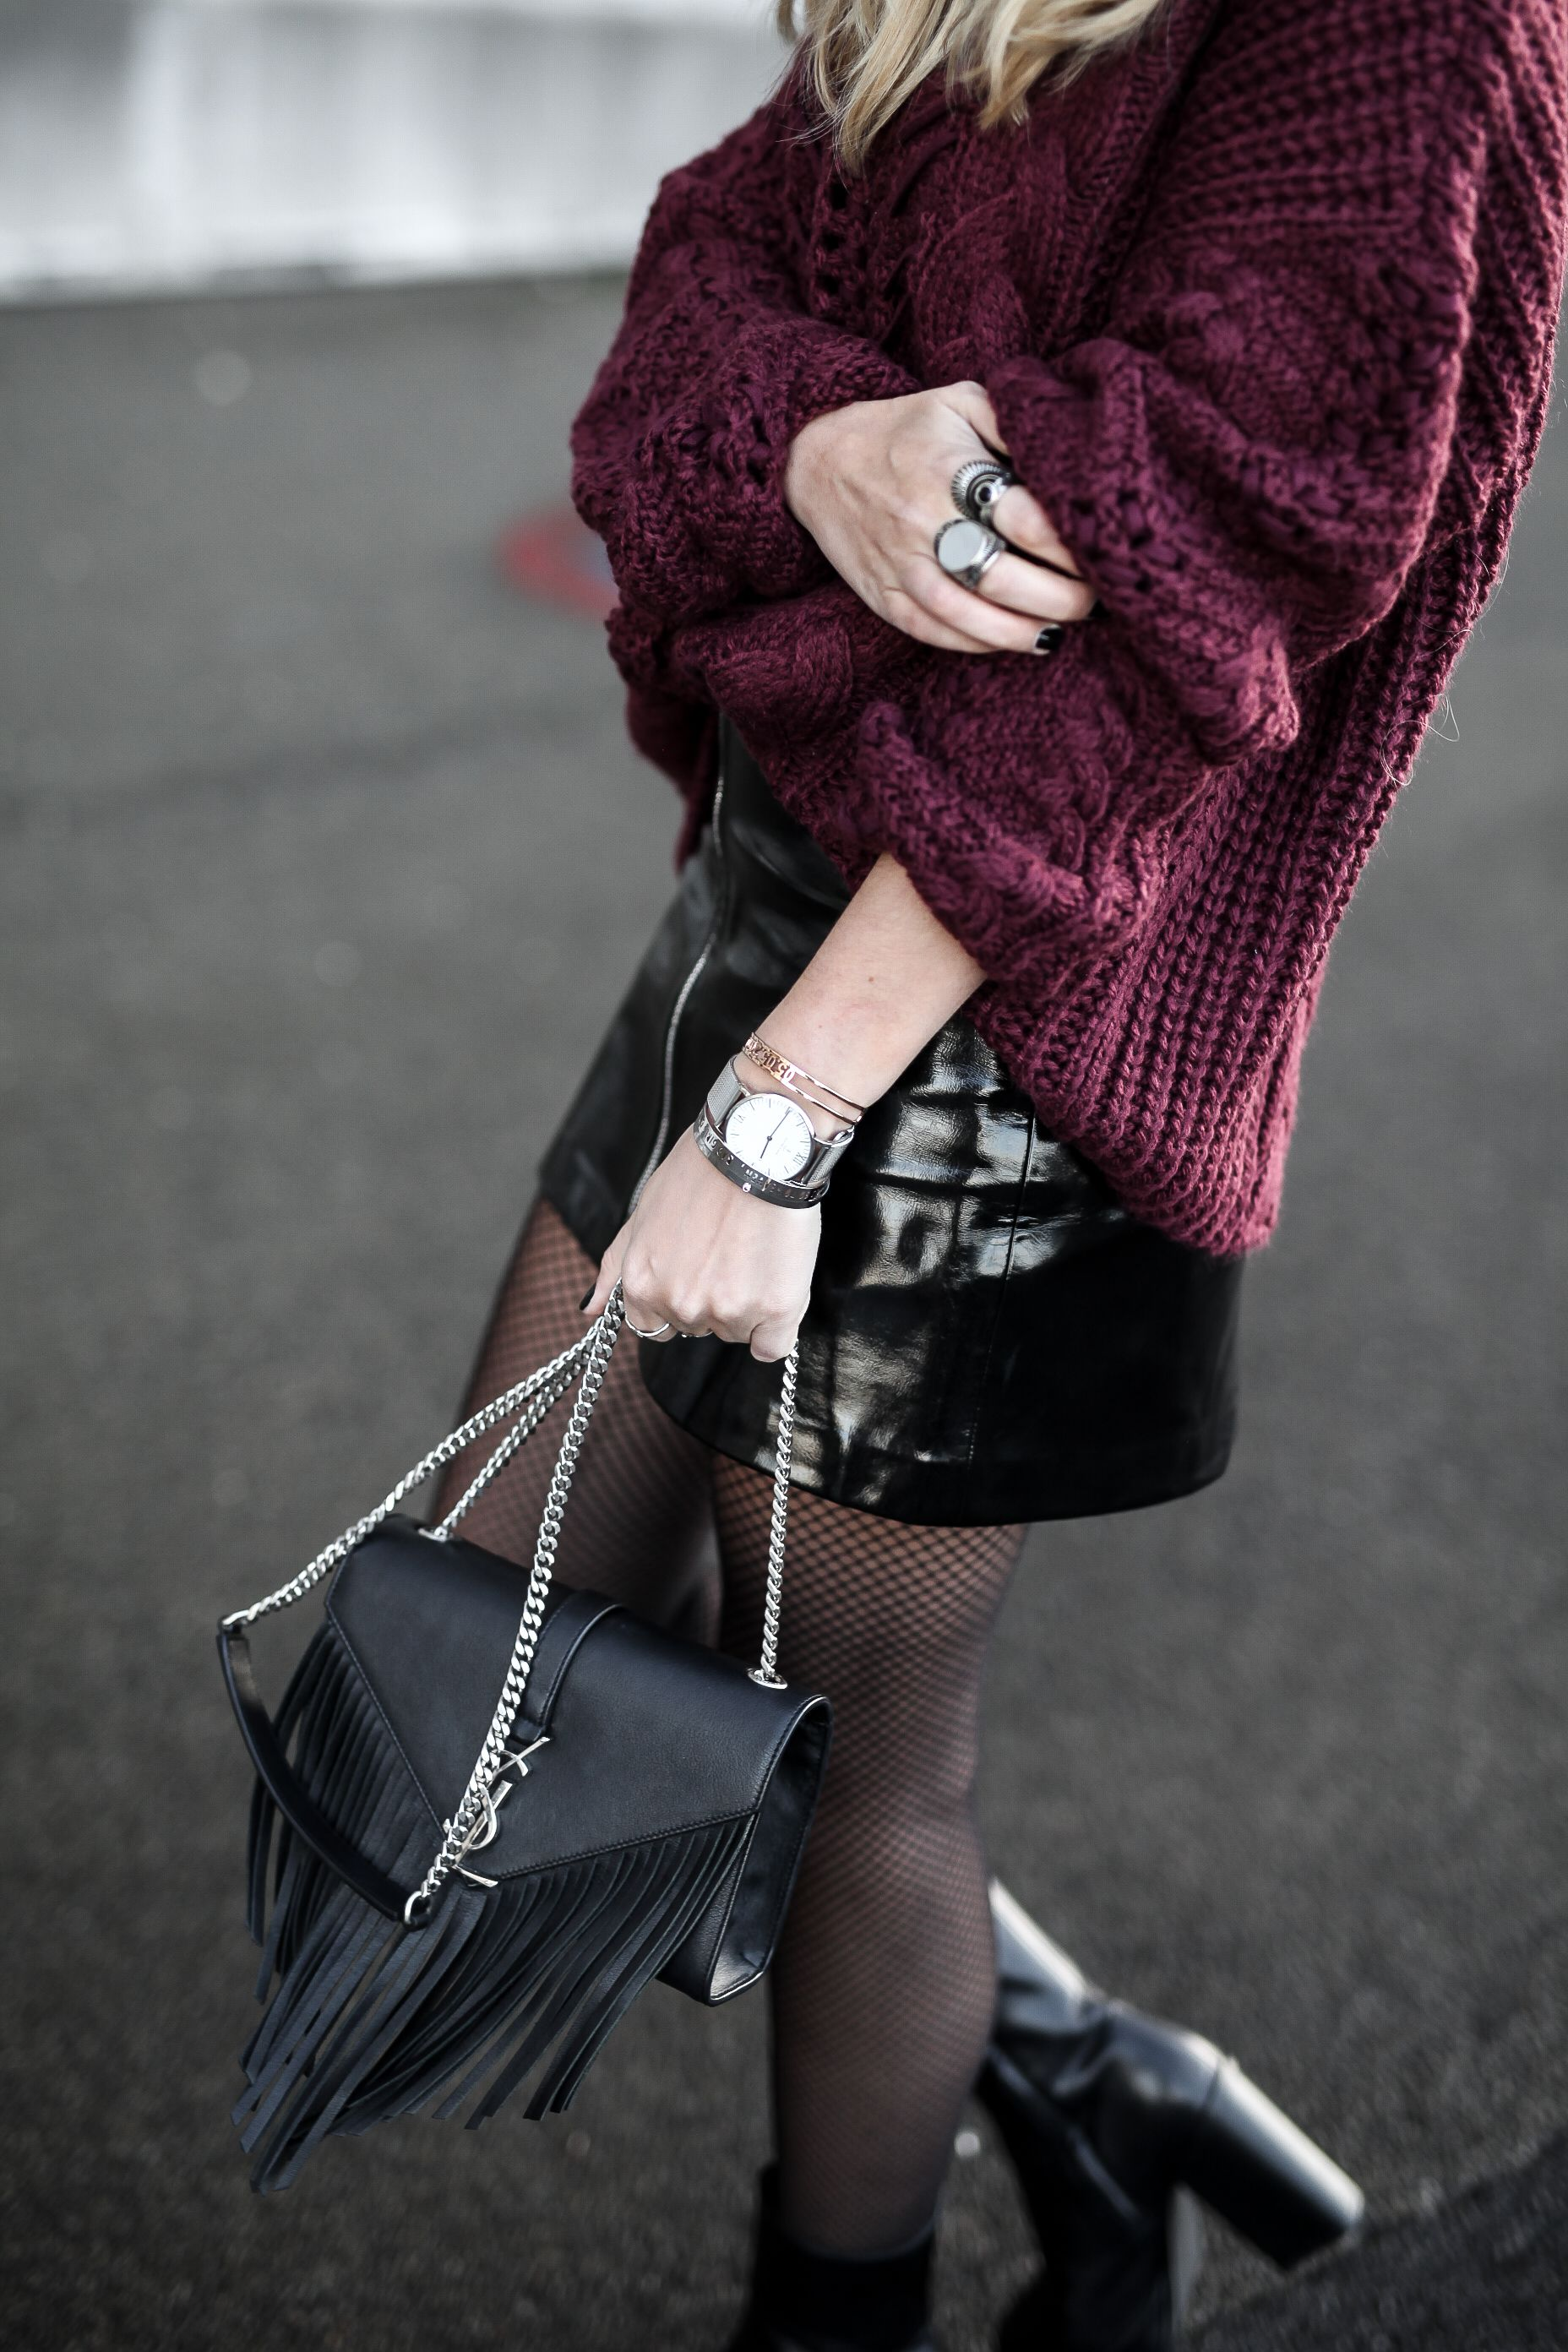 80bb59d63e6 jupe vinyle - Tendance mode hiver 2018  winter  mode  fashion  tendance2018   tendancefemme